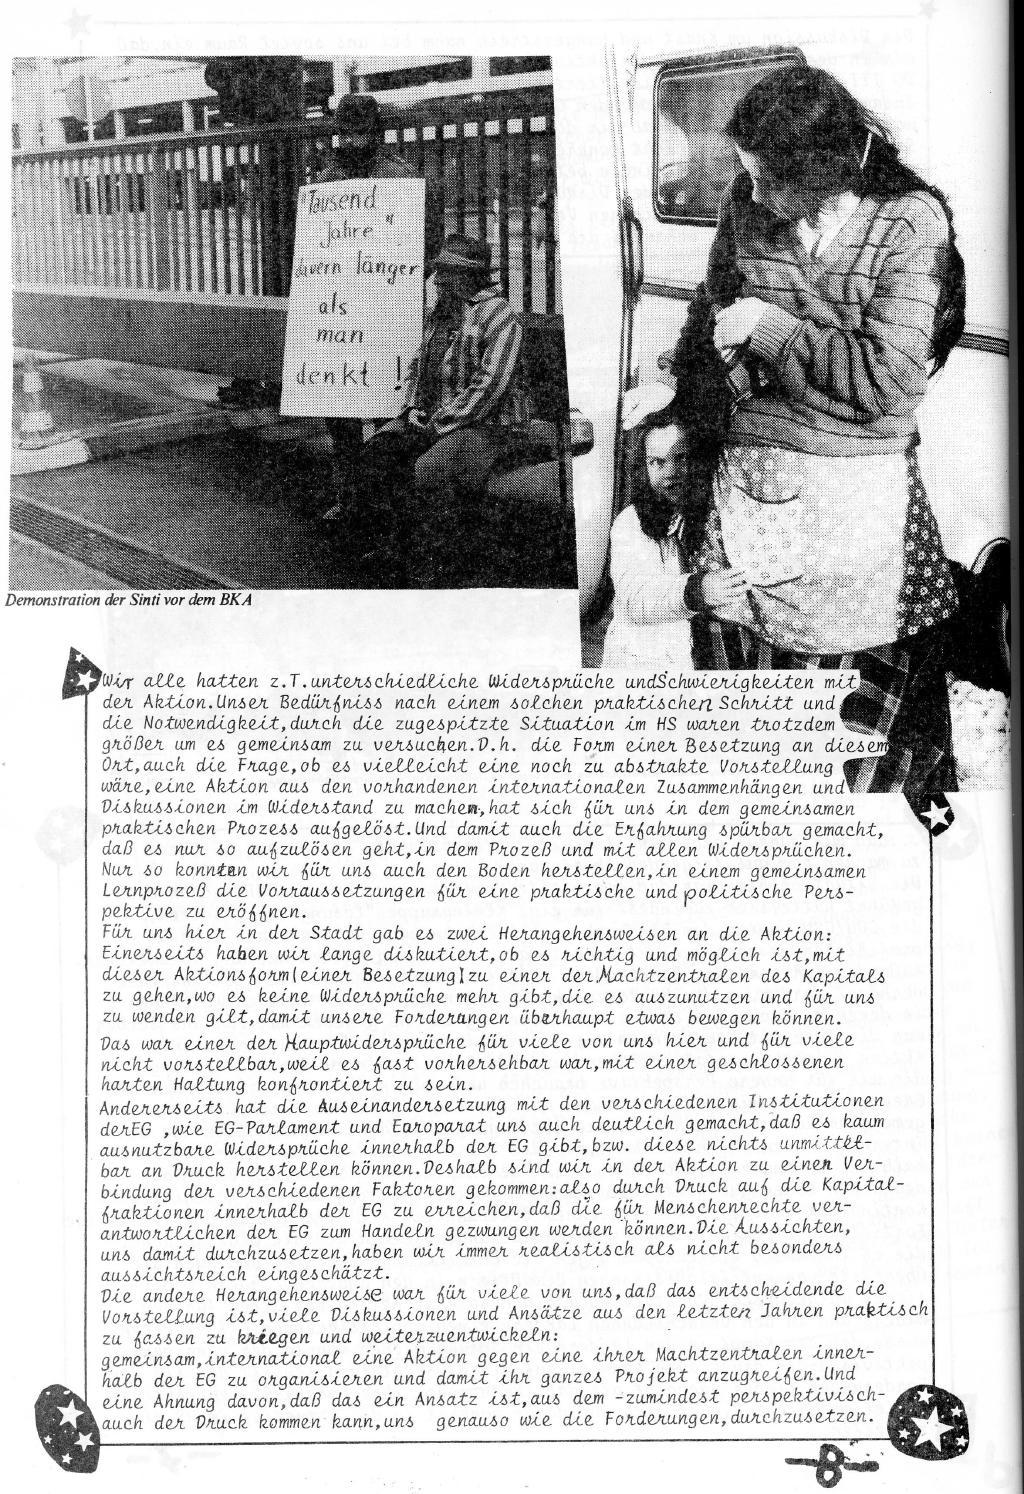 Belgien_Doku_Besetzung_EG_Kommission_1989_010